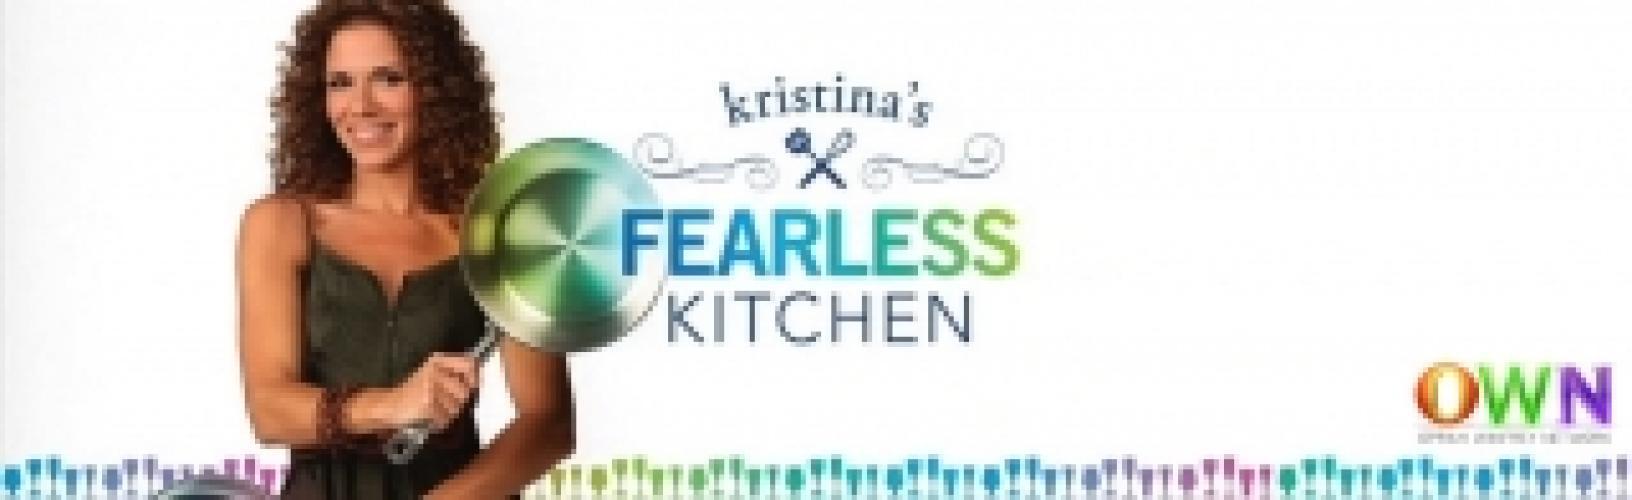 Fearless Kitchen next episode air date poster